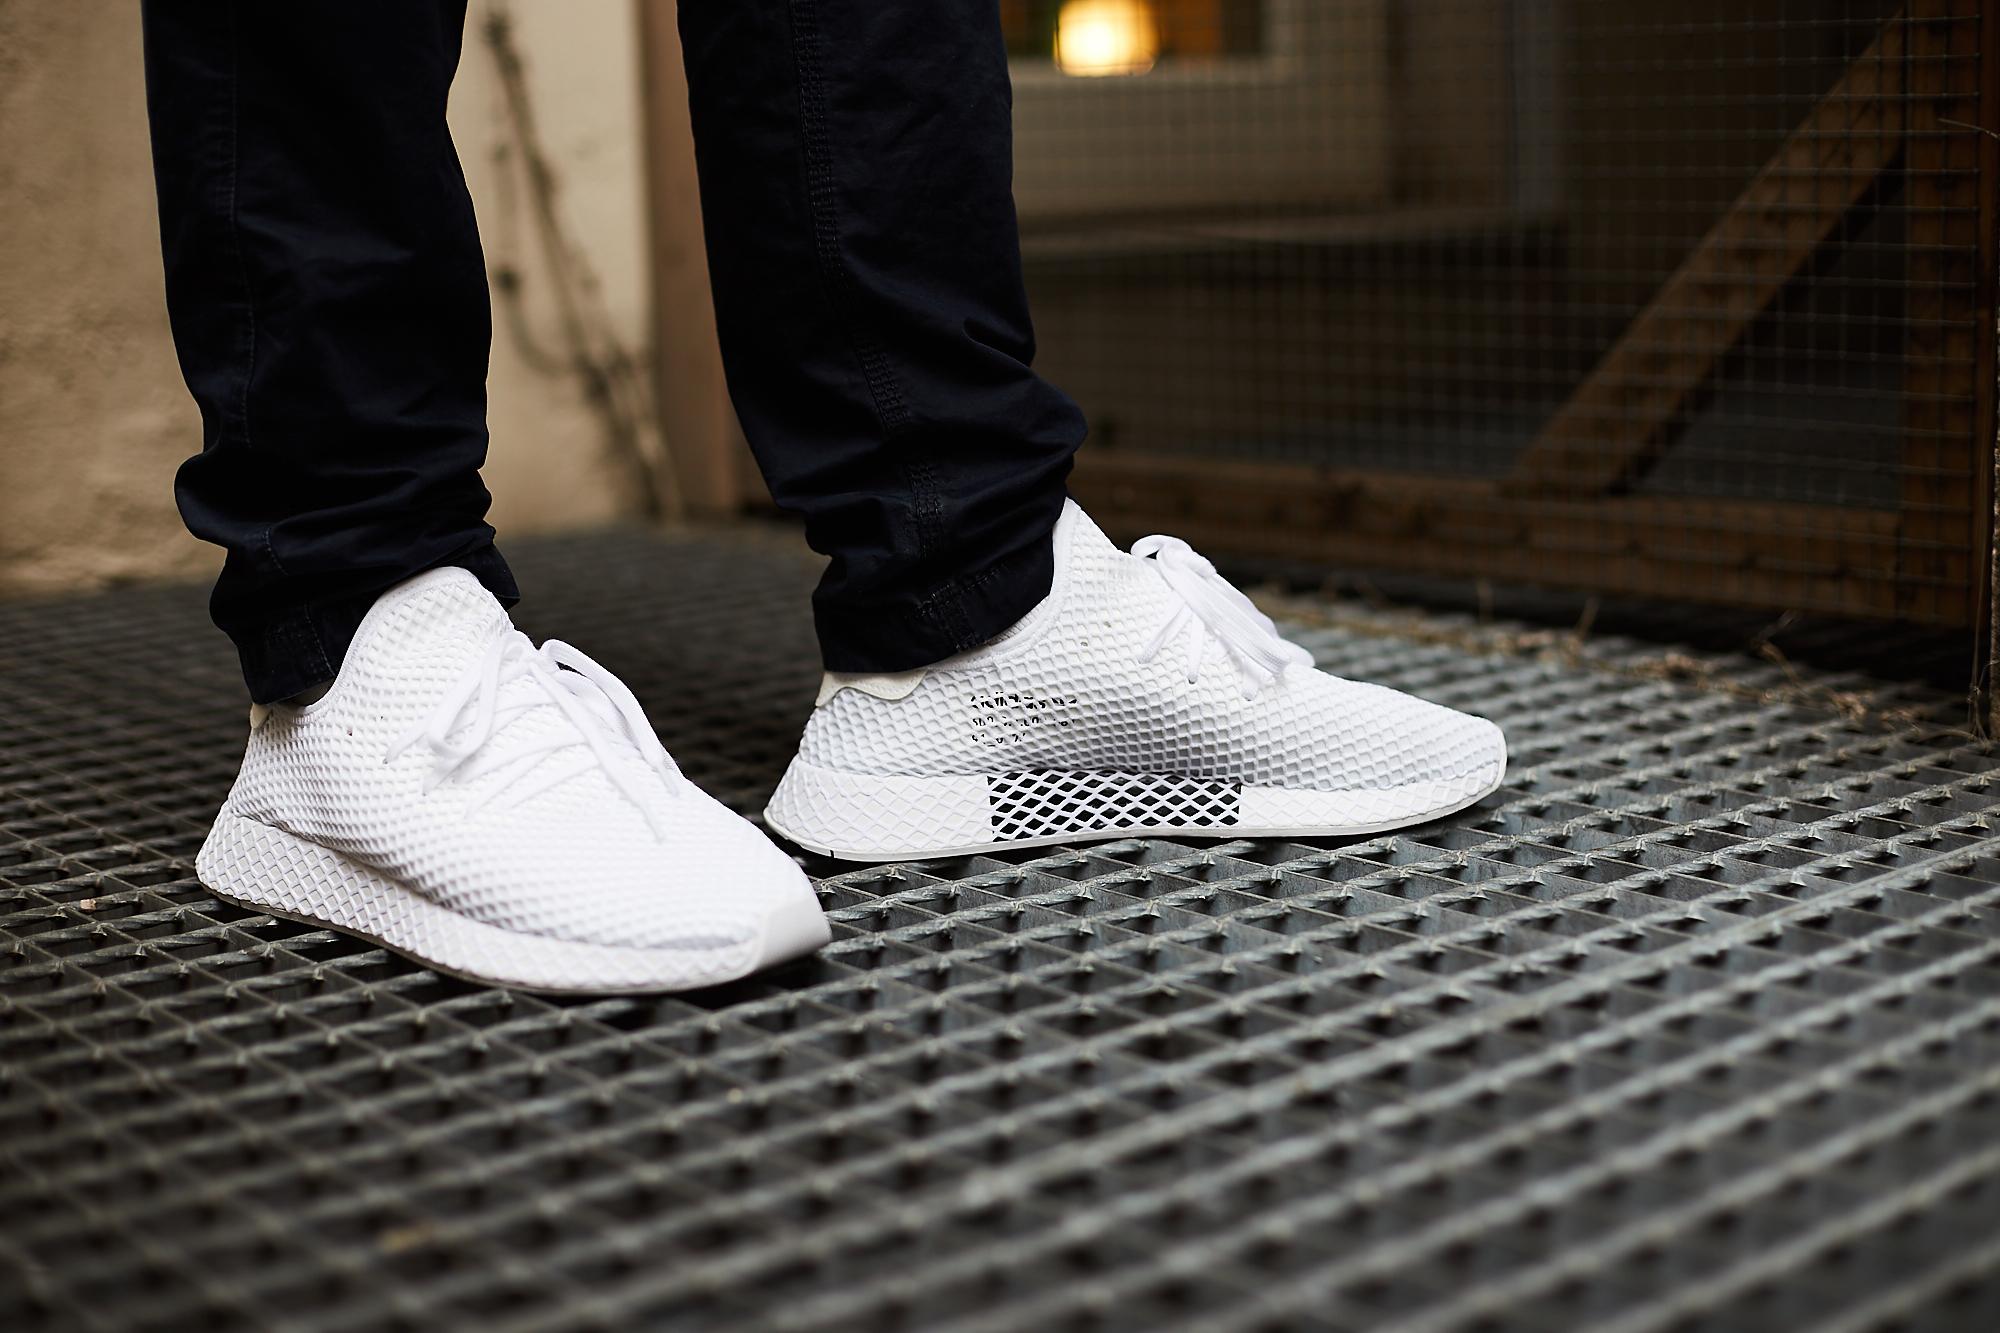 Adidas Releases The Deerupt | Animal